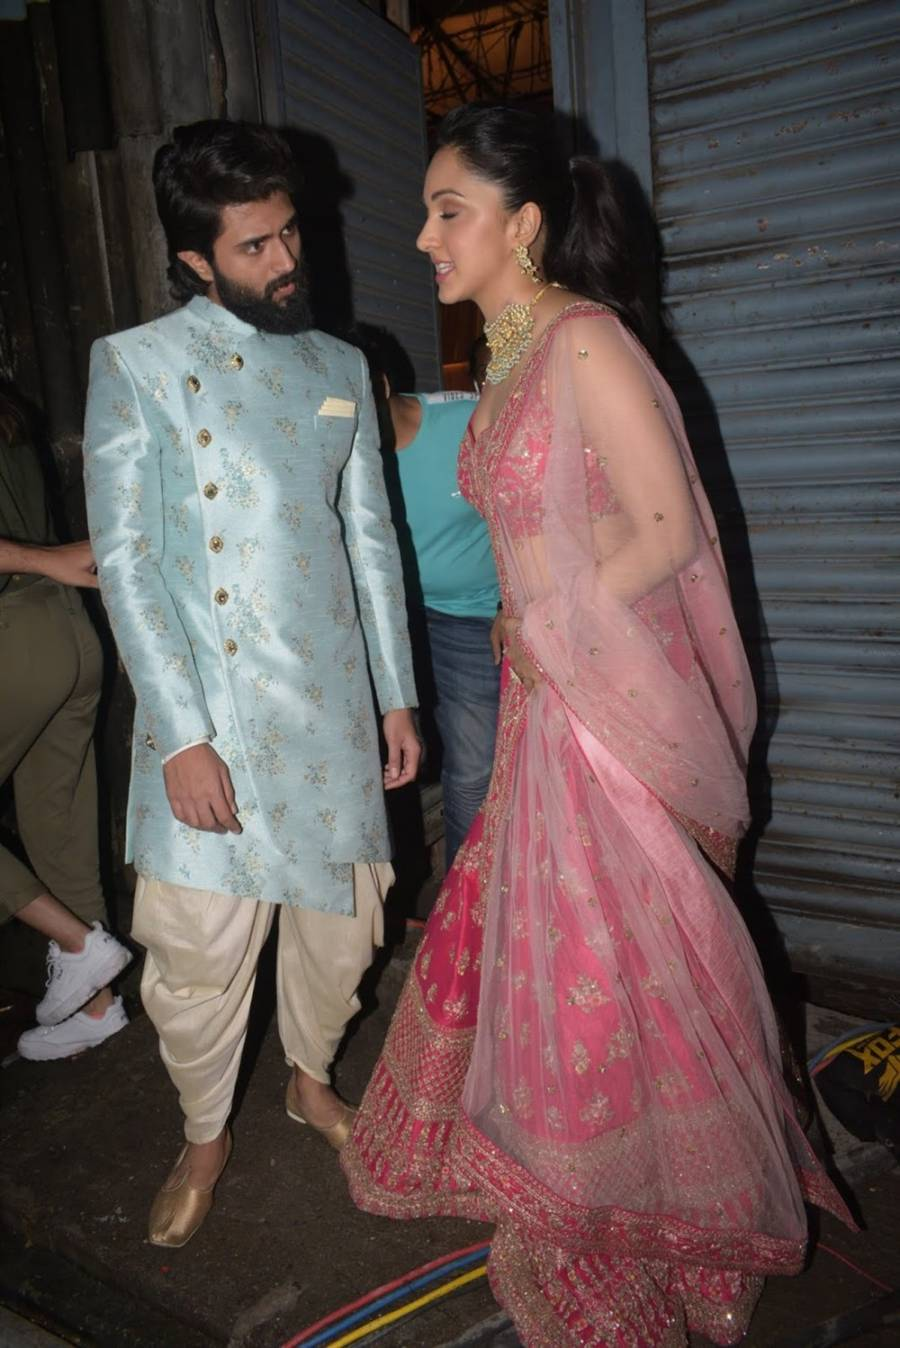 Glamorous Indian Actress Kiara Advani In Pink Lehenga Choli